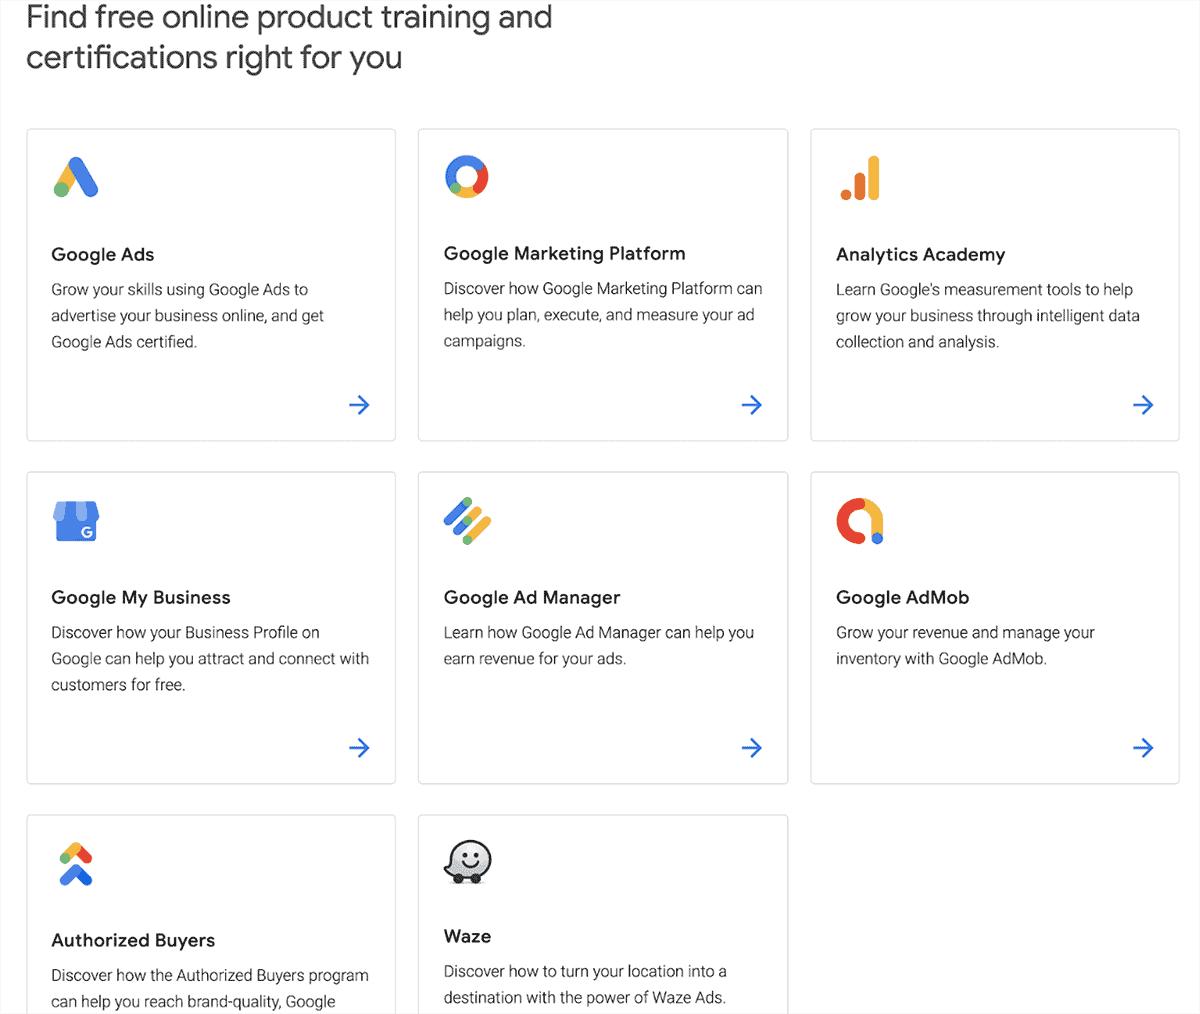 Google Skillshop offerings